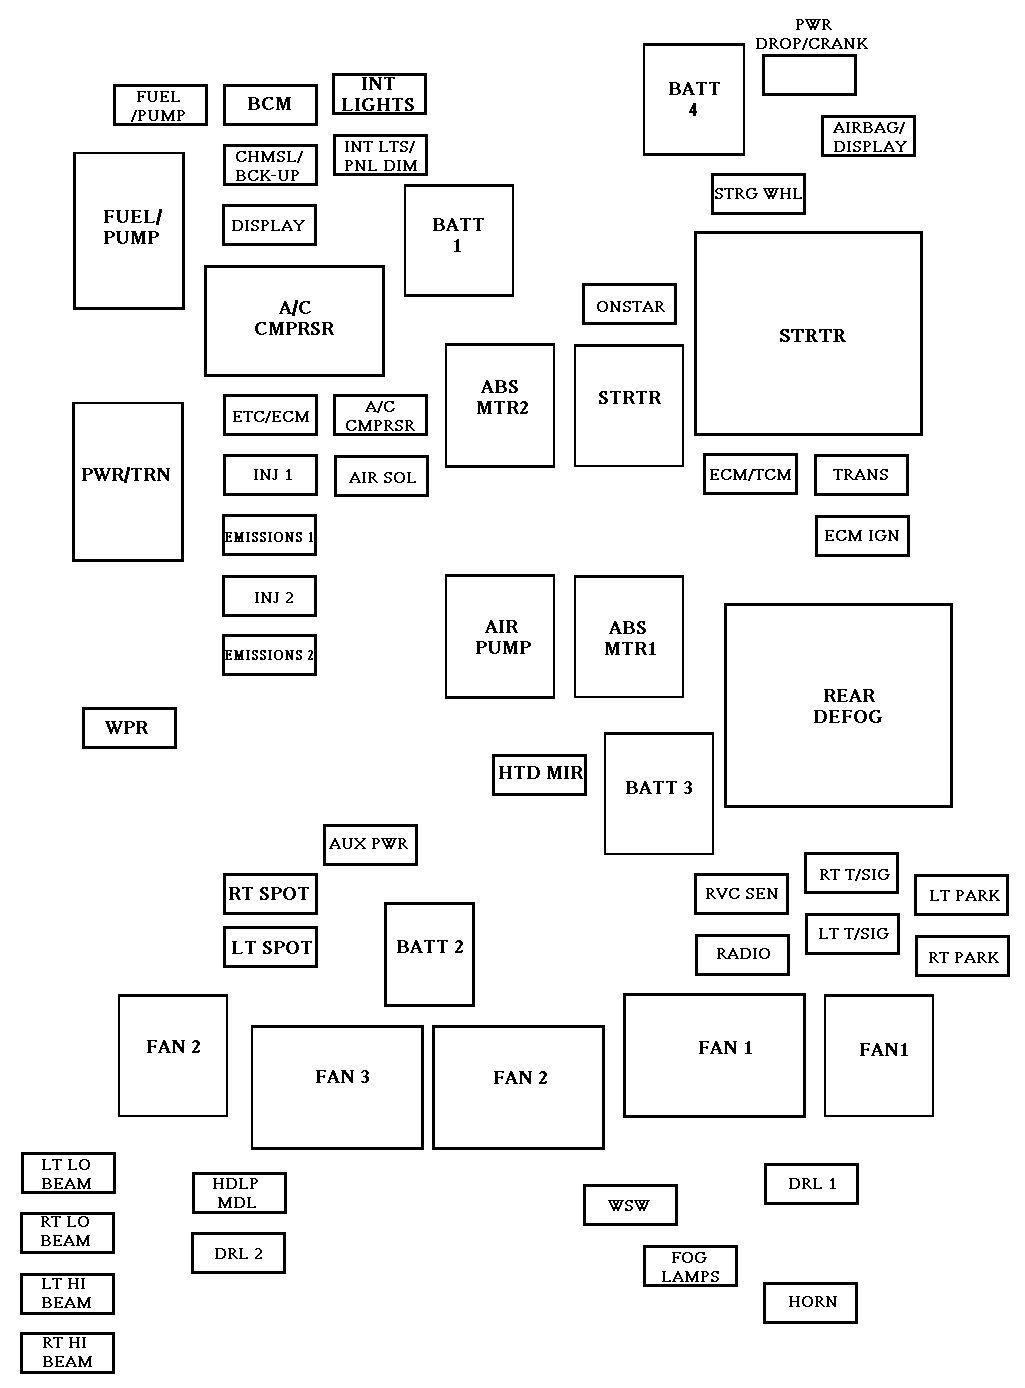 2005 chevy impala under hood fuse diagram wiring diagramig chevy impala underhood fuse diagram wiring diagrams1963 impala fuse box wiring library ig chevy impala